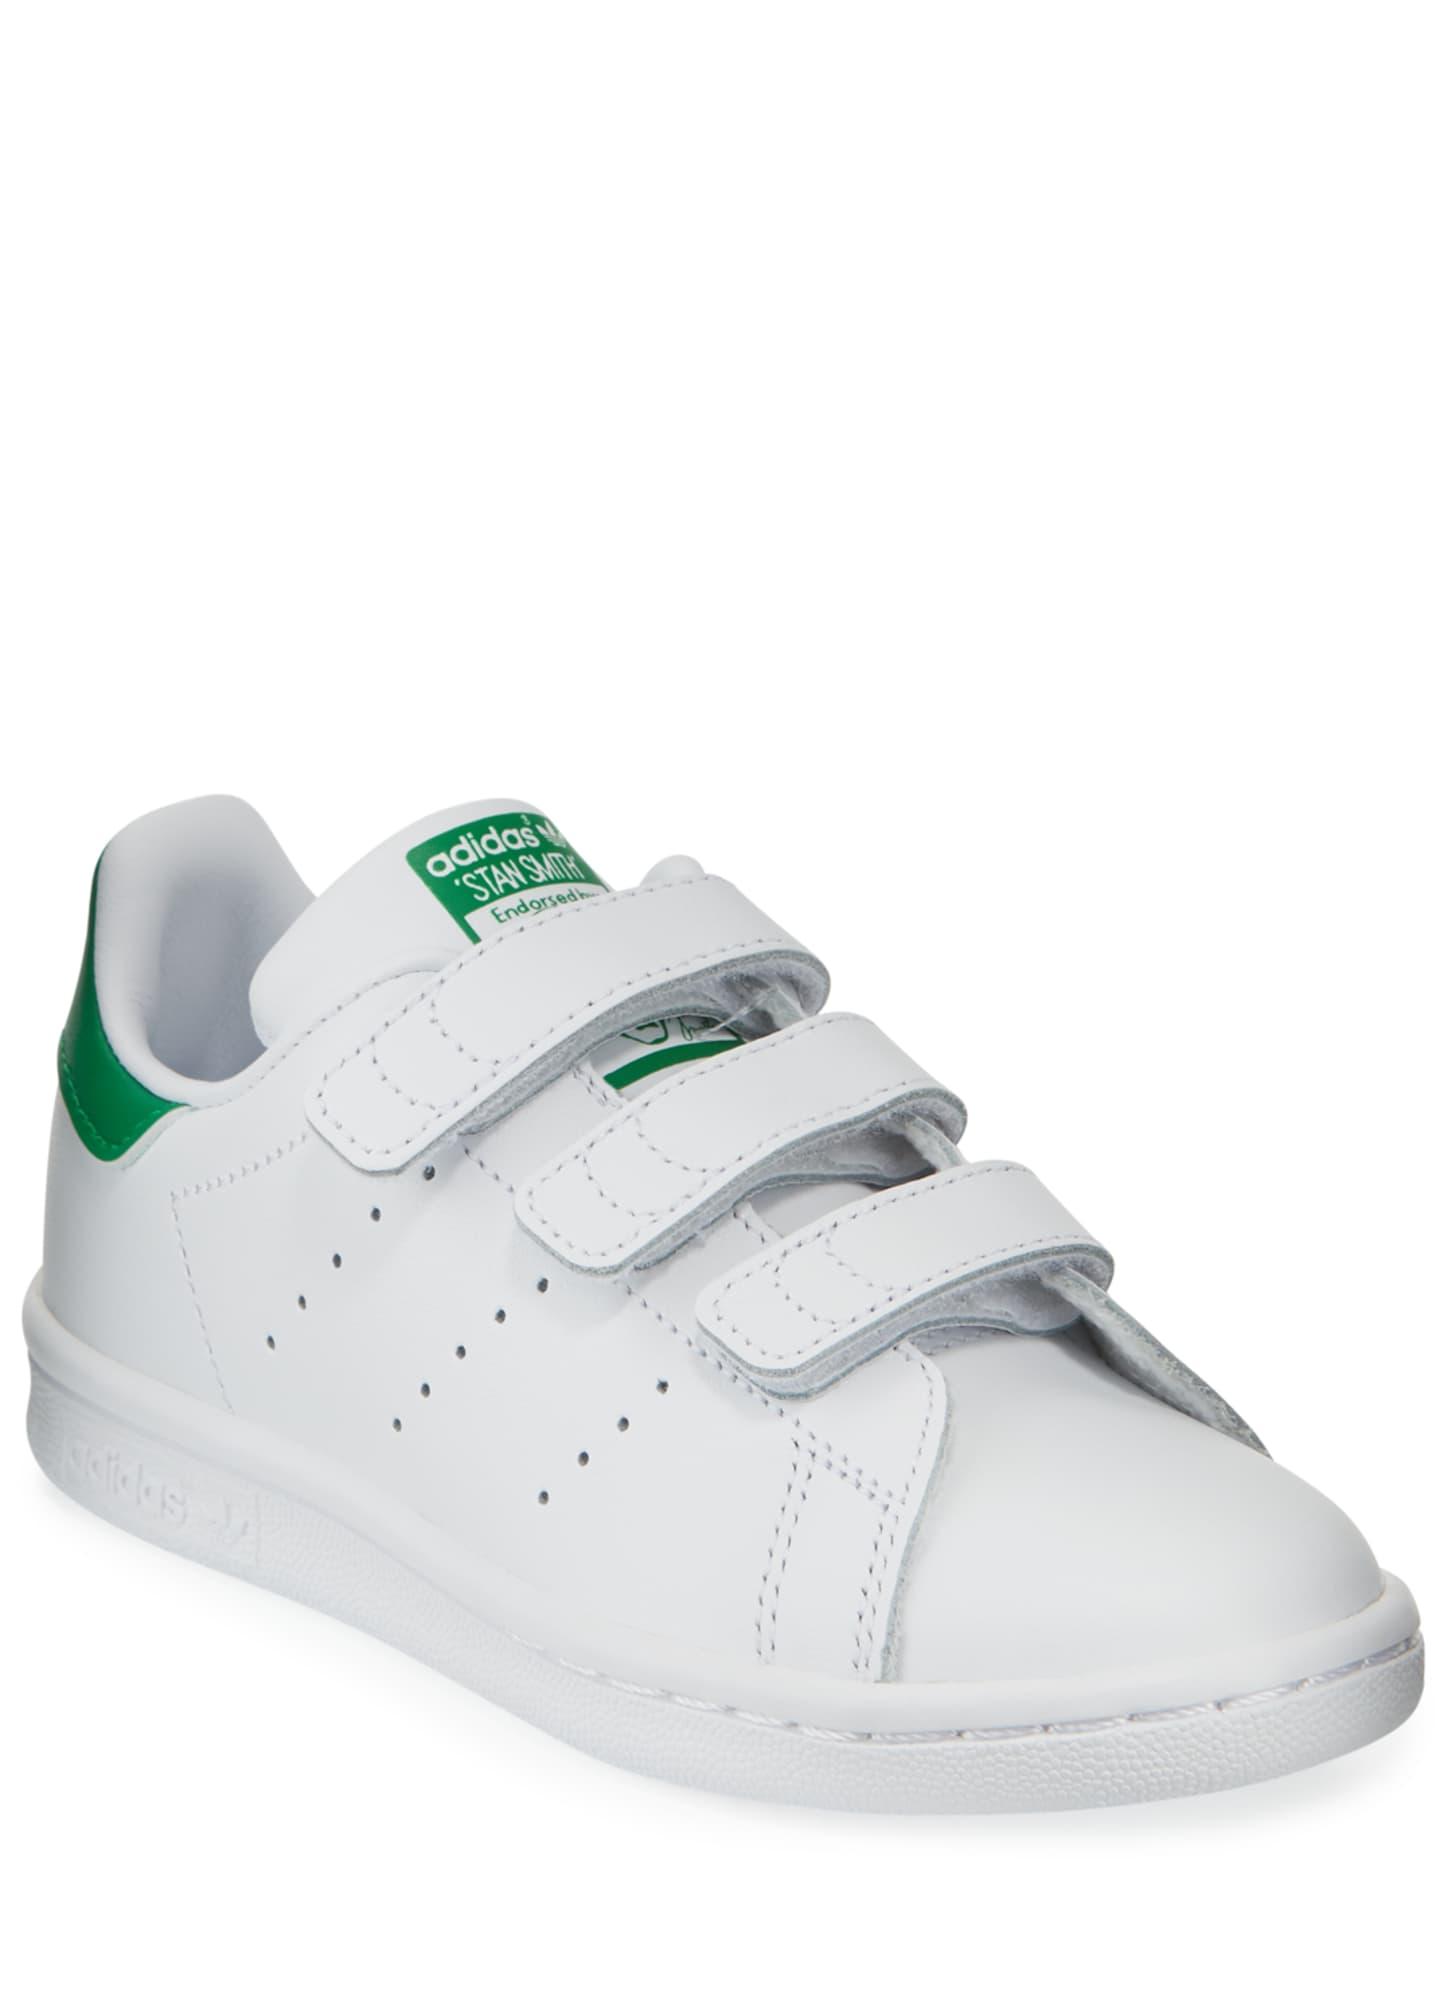 stan smith adidas 4